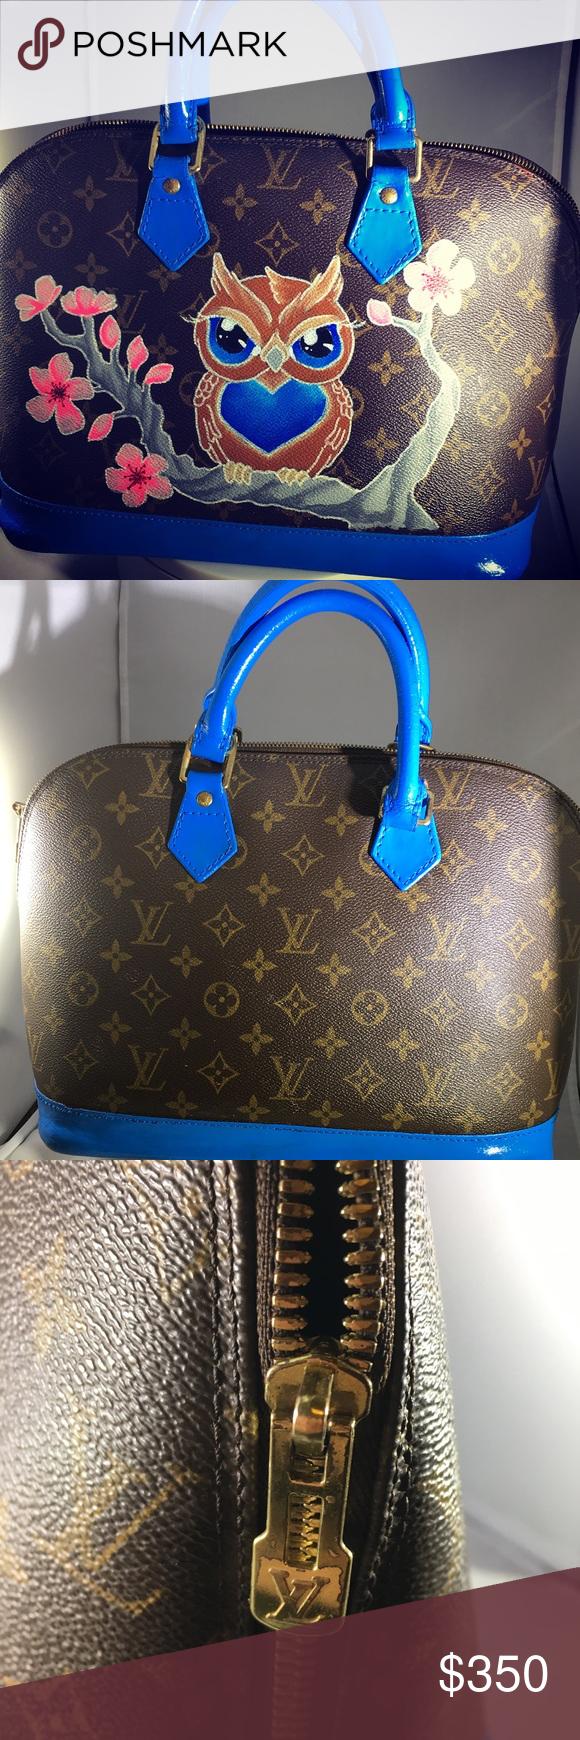 🔥NO TRADE!!!!!🔥 Louis Vuitton Montaigne mm size b3693085d6